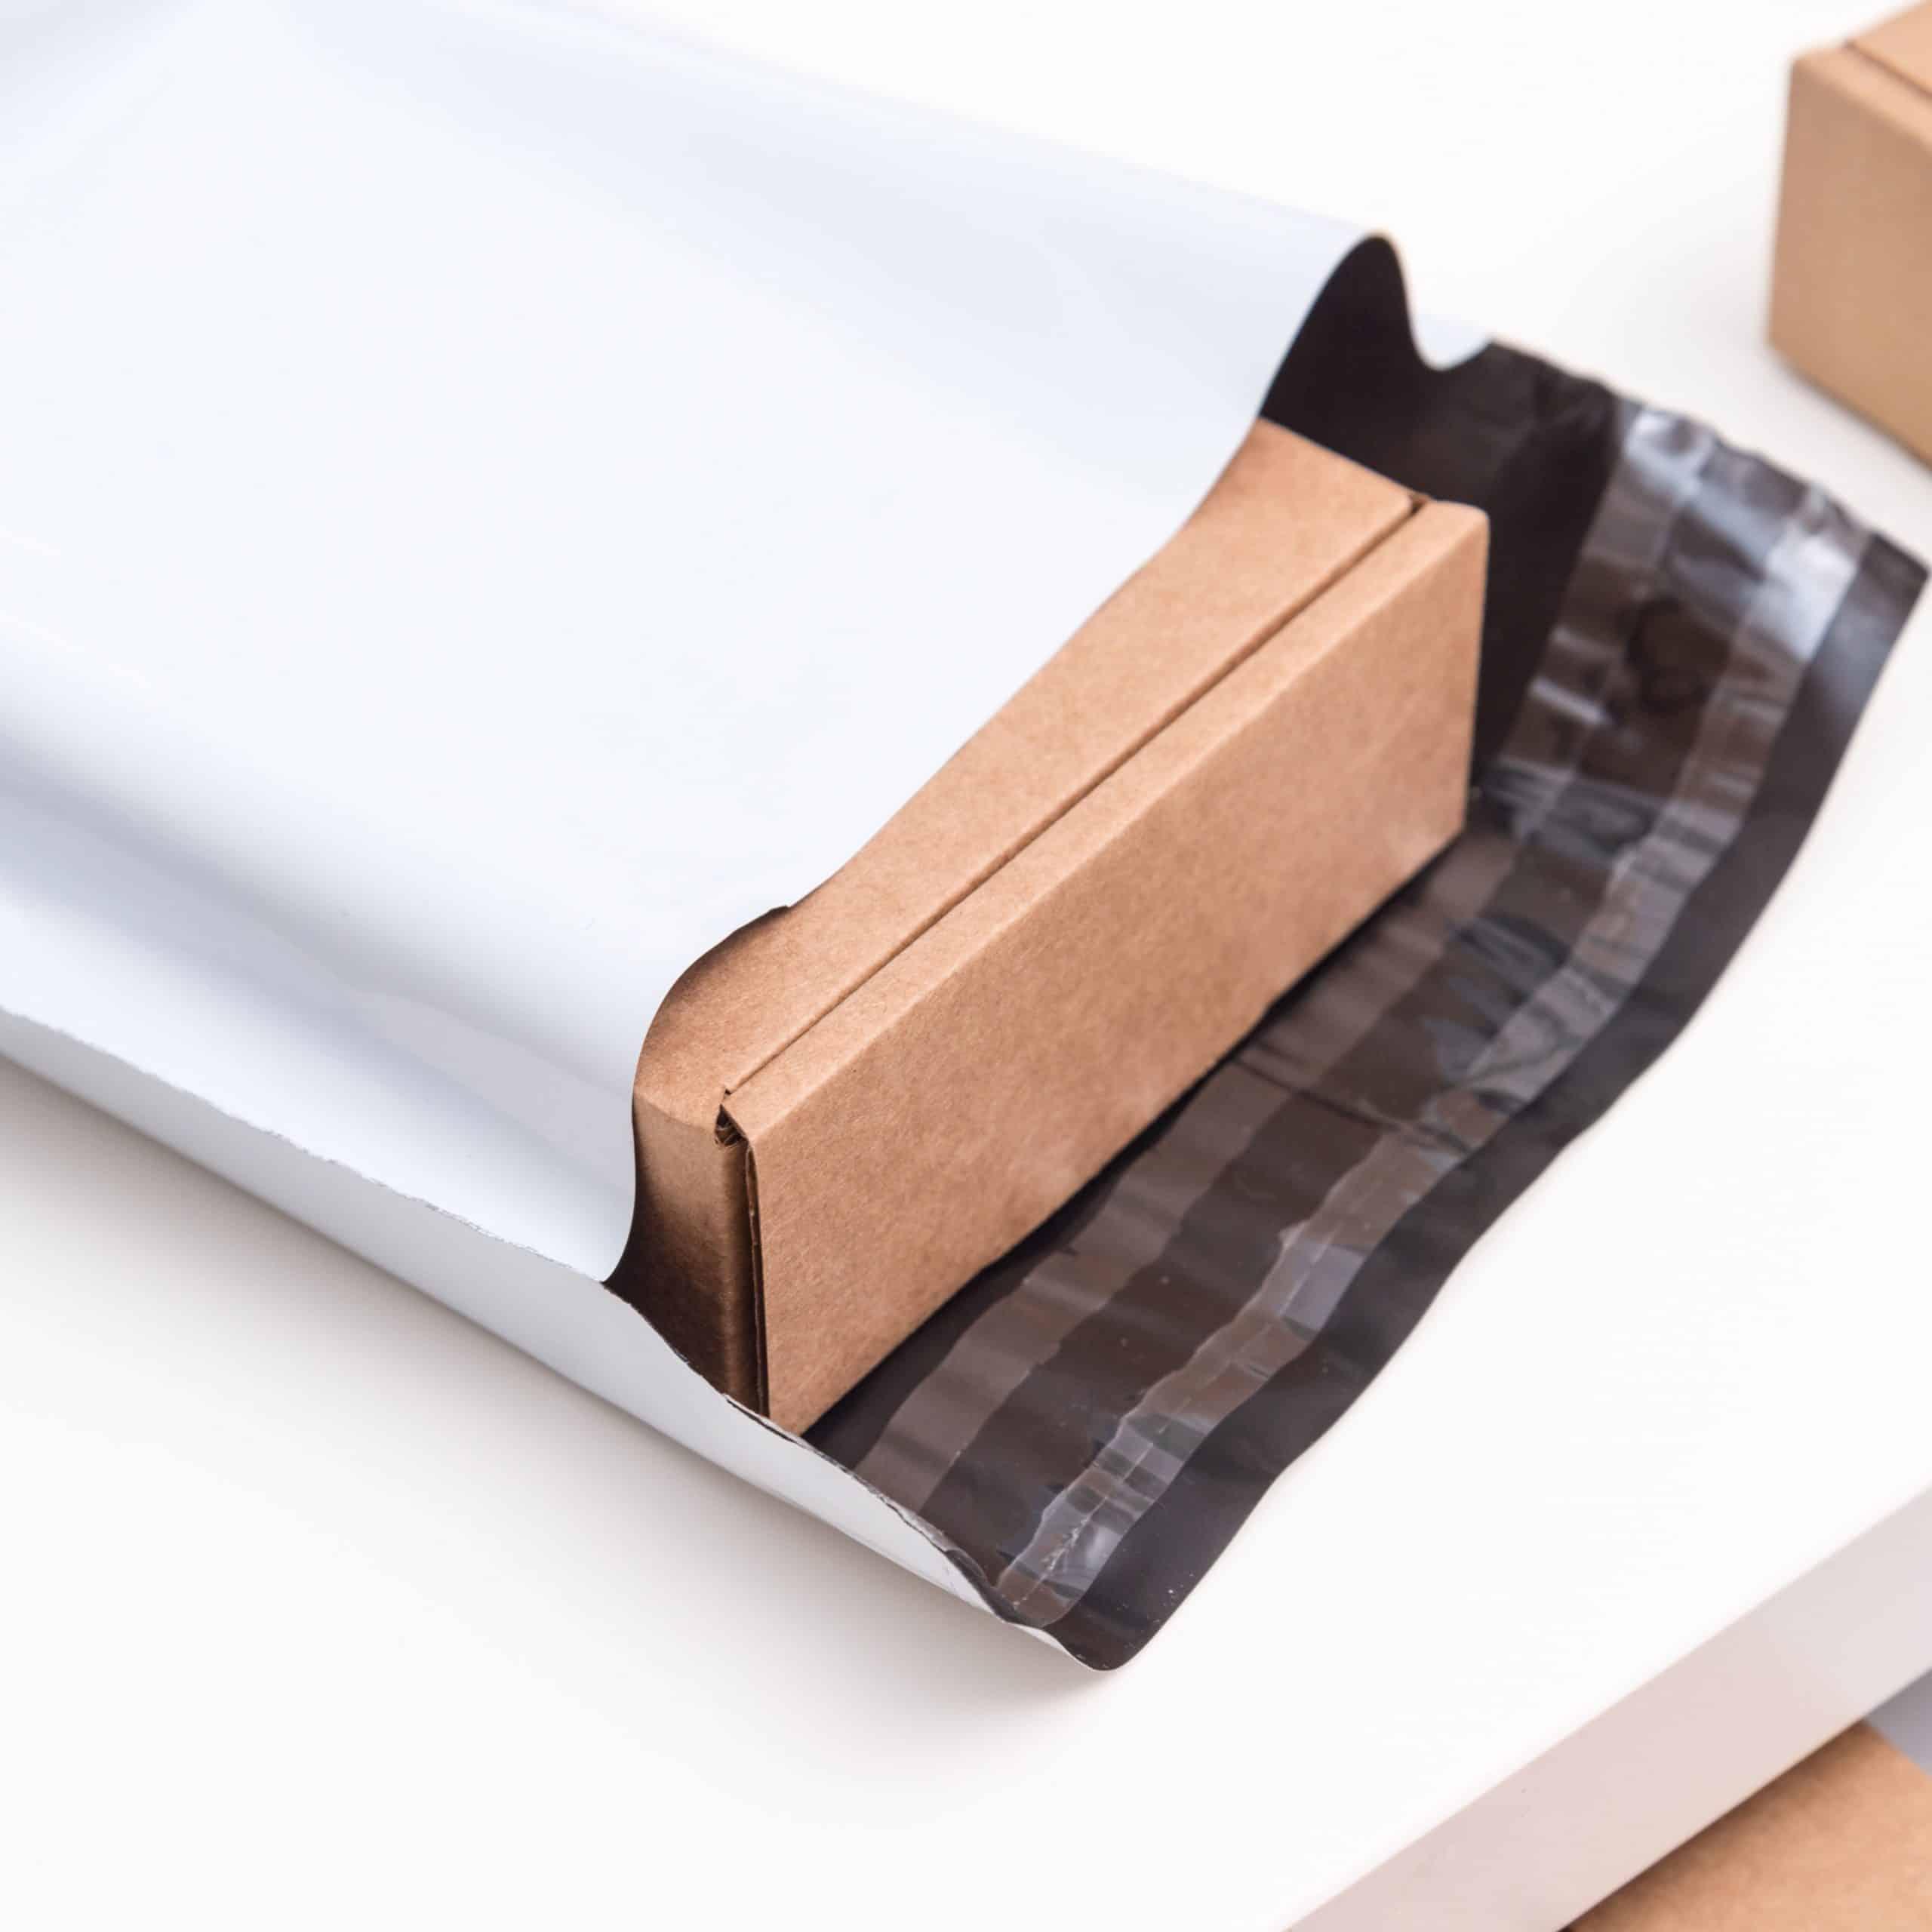 Busta flyer shipping envelopes shipping bags envelopes Oniloc